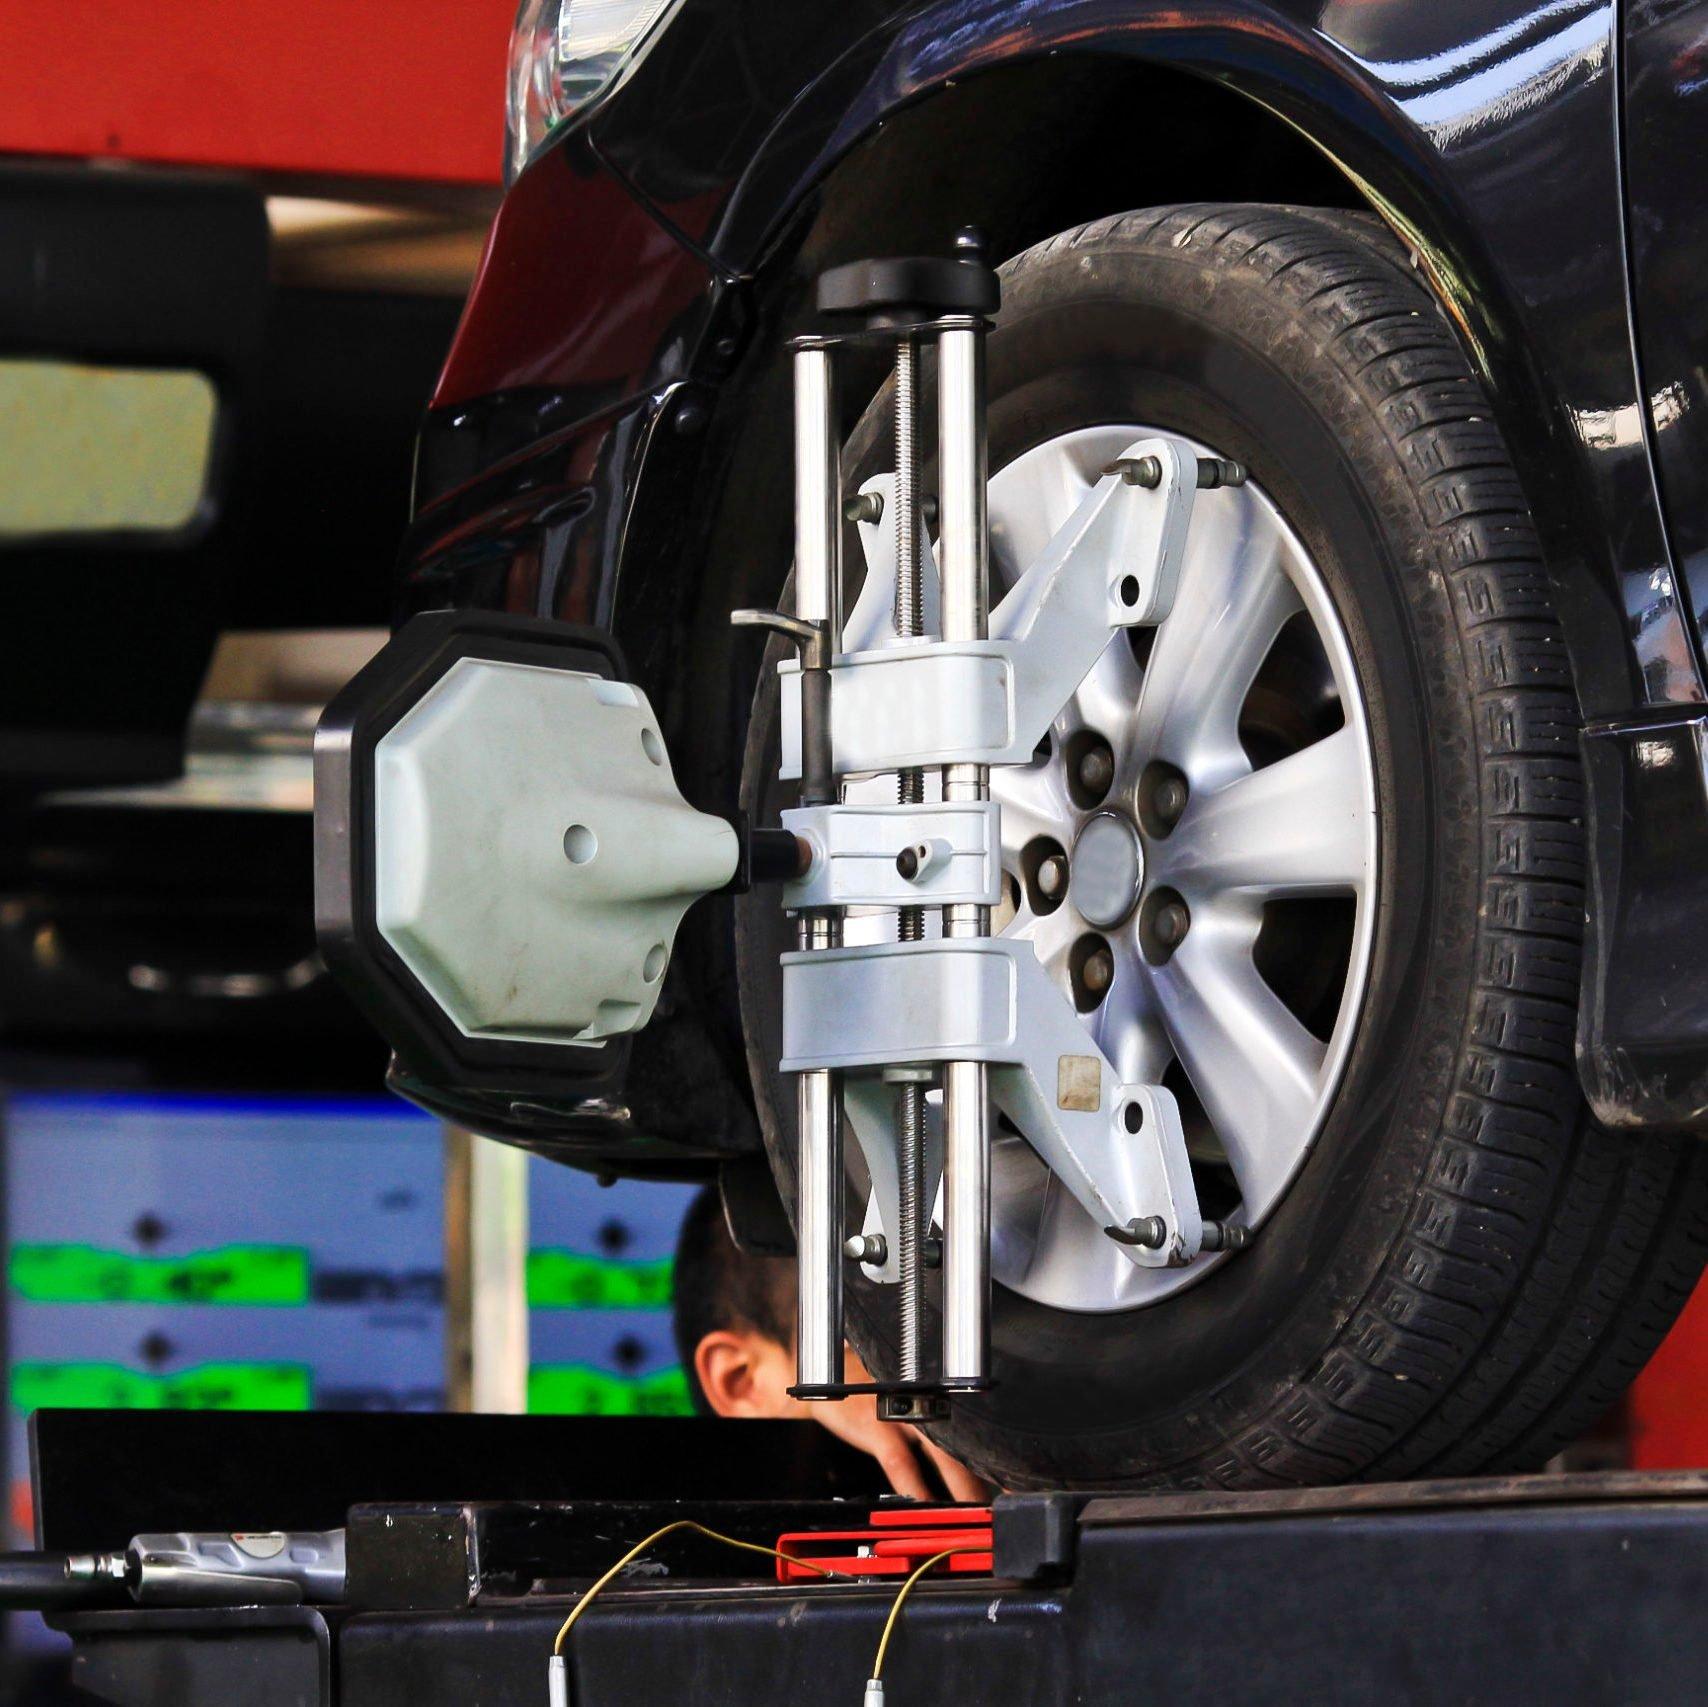 computerized wheel alignment machine clamp